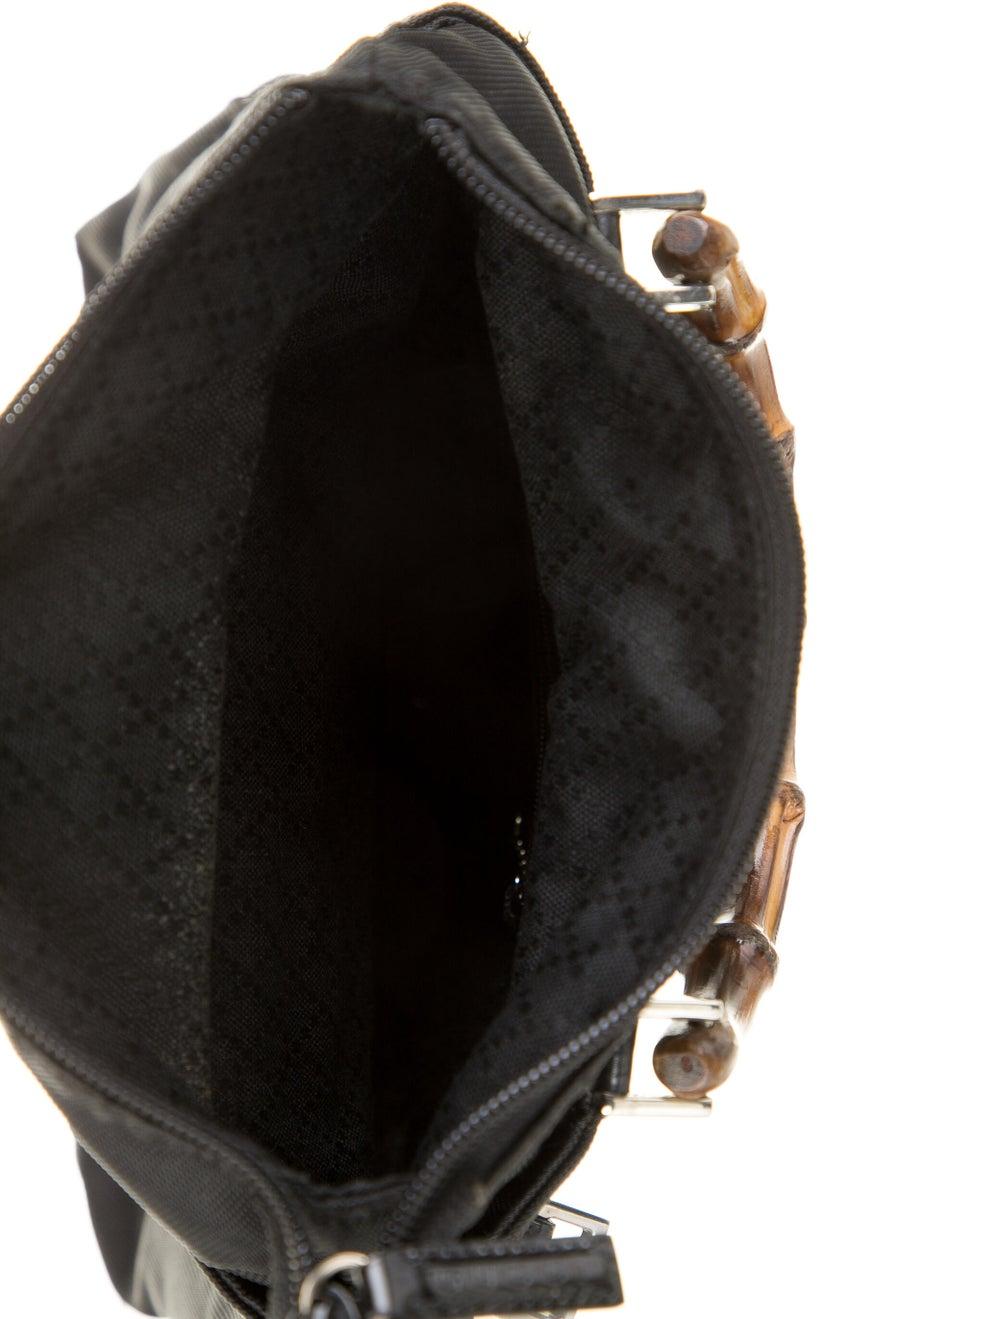 Gucci Bamboo Nylon Satchel Black - image 5